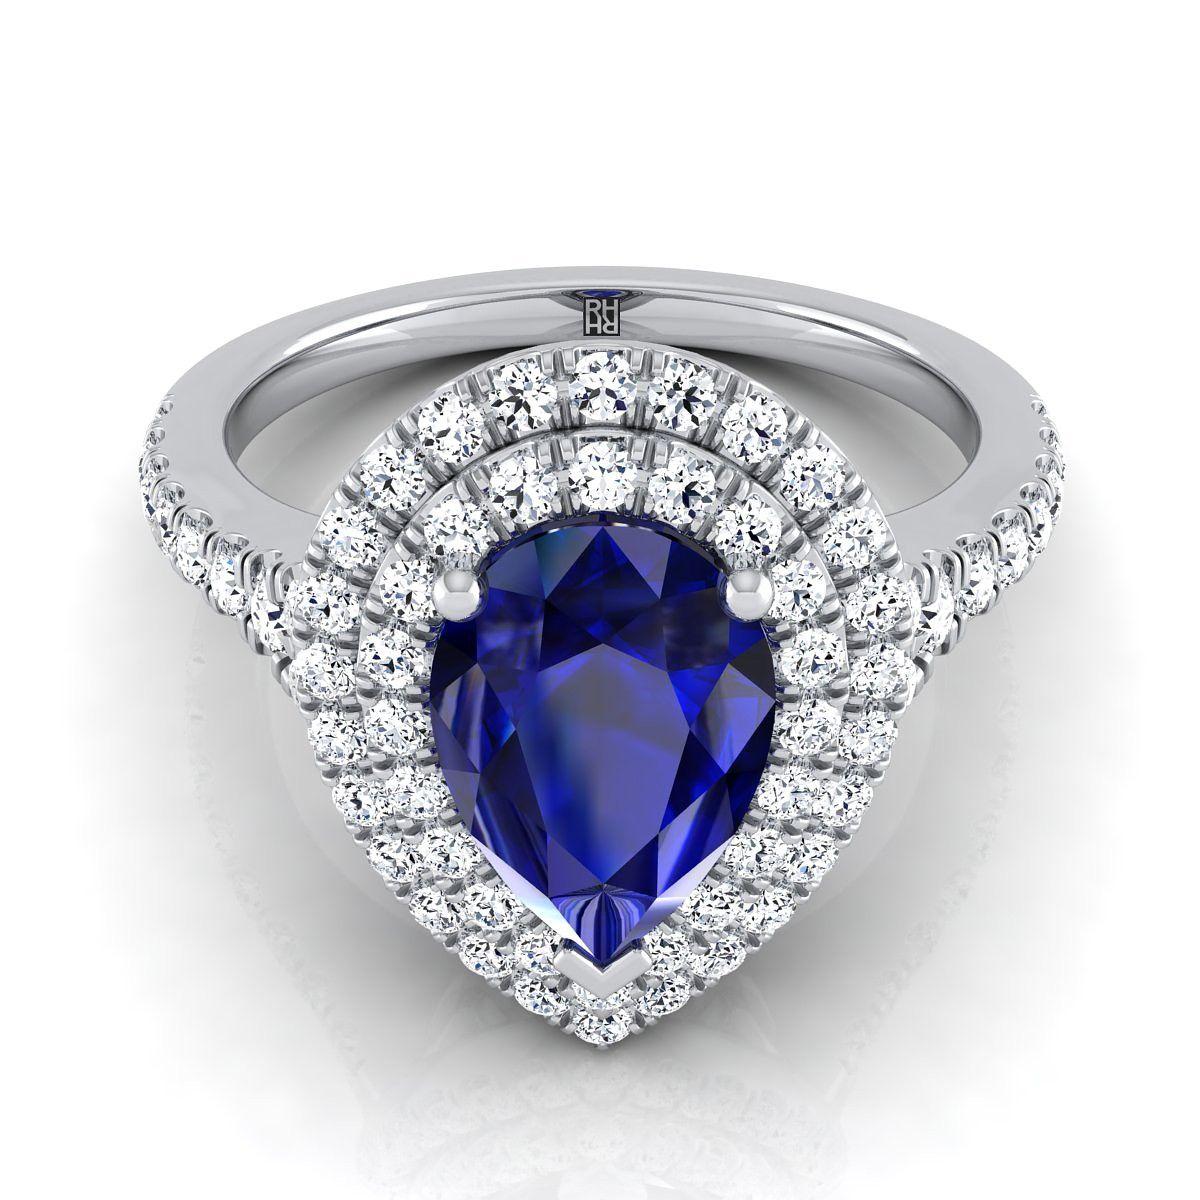 Sapphire Pear Shape Center With Diamond Double Halo